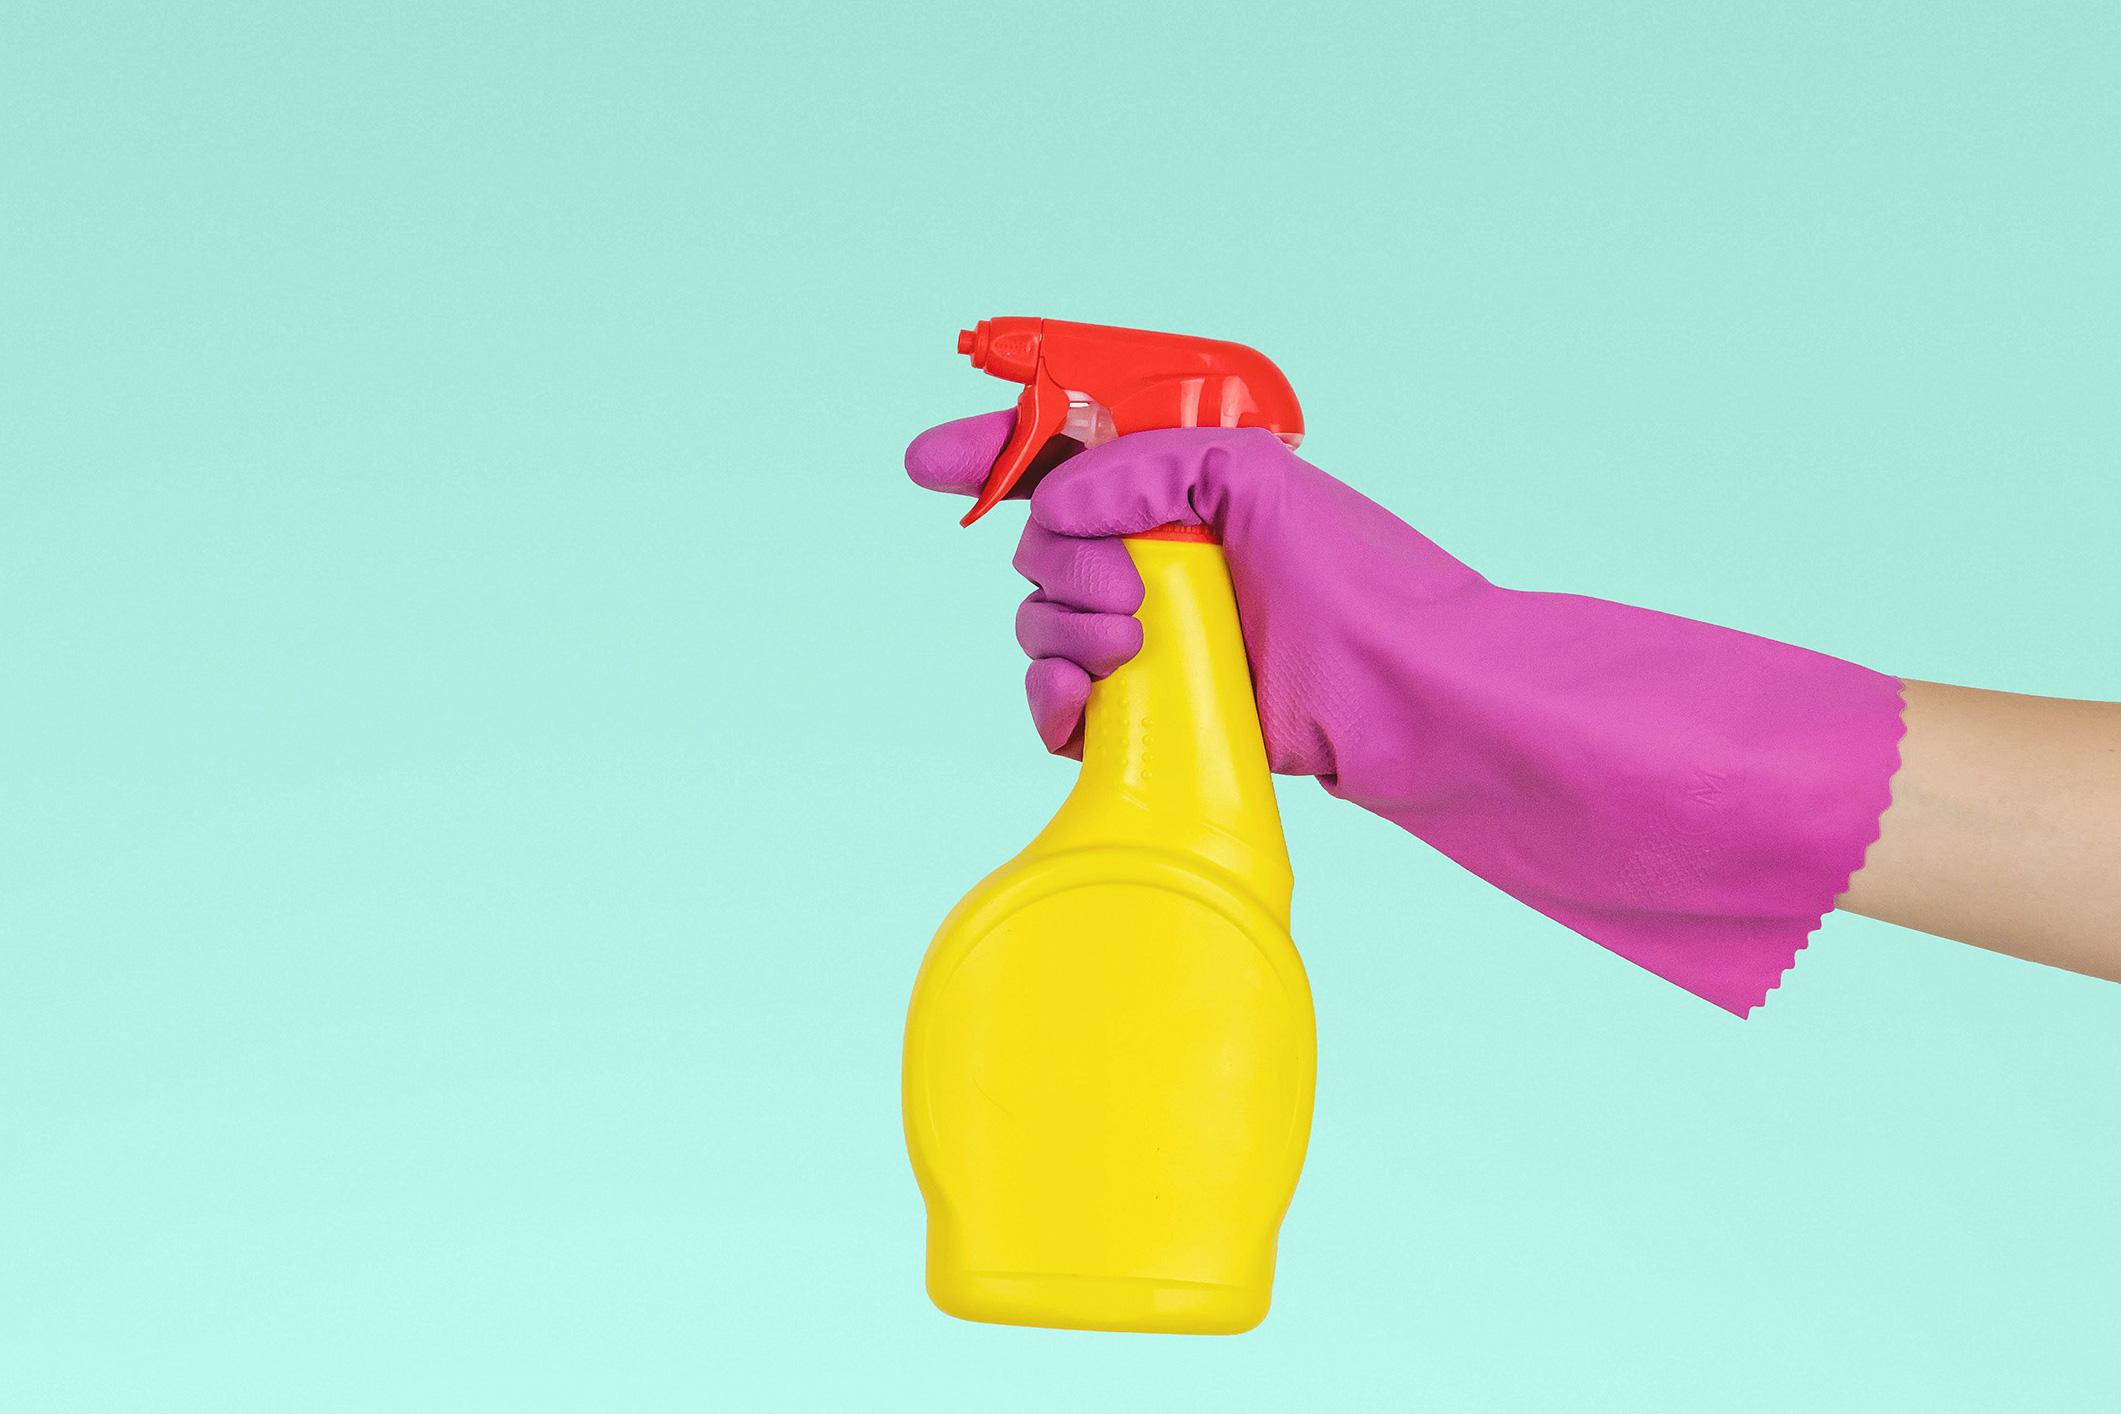 Keep calm and… contrata uma empresa de limpeza